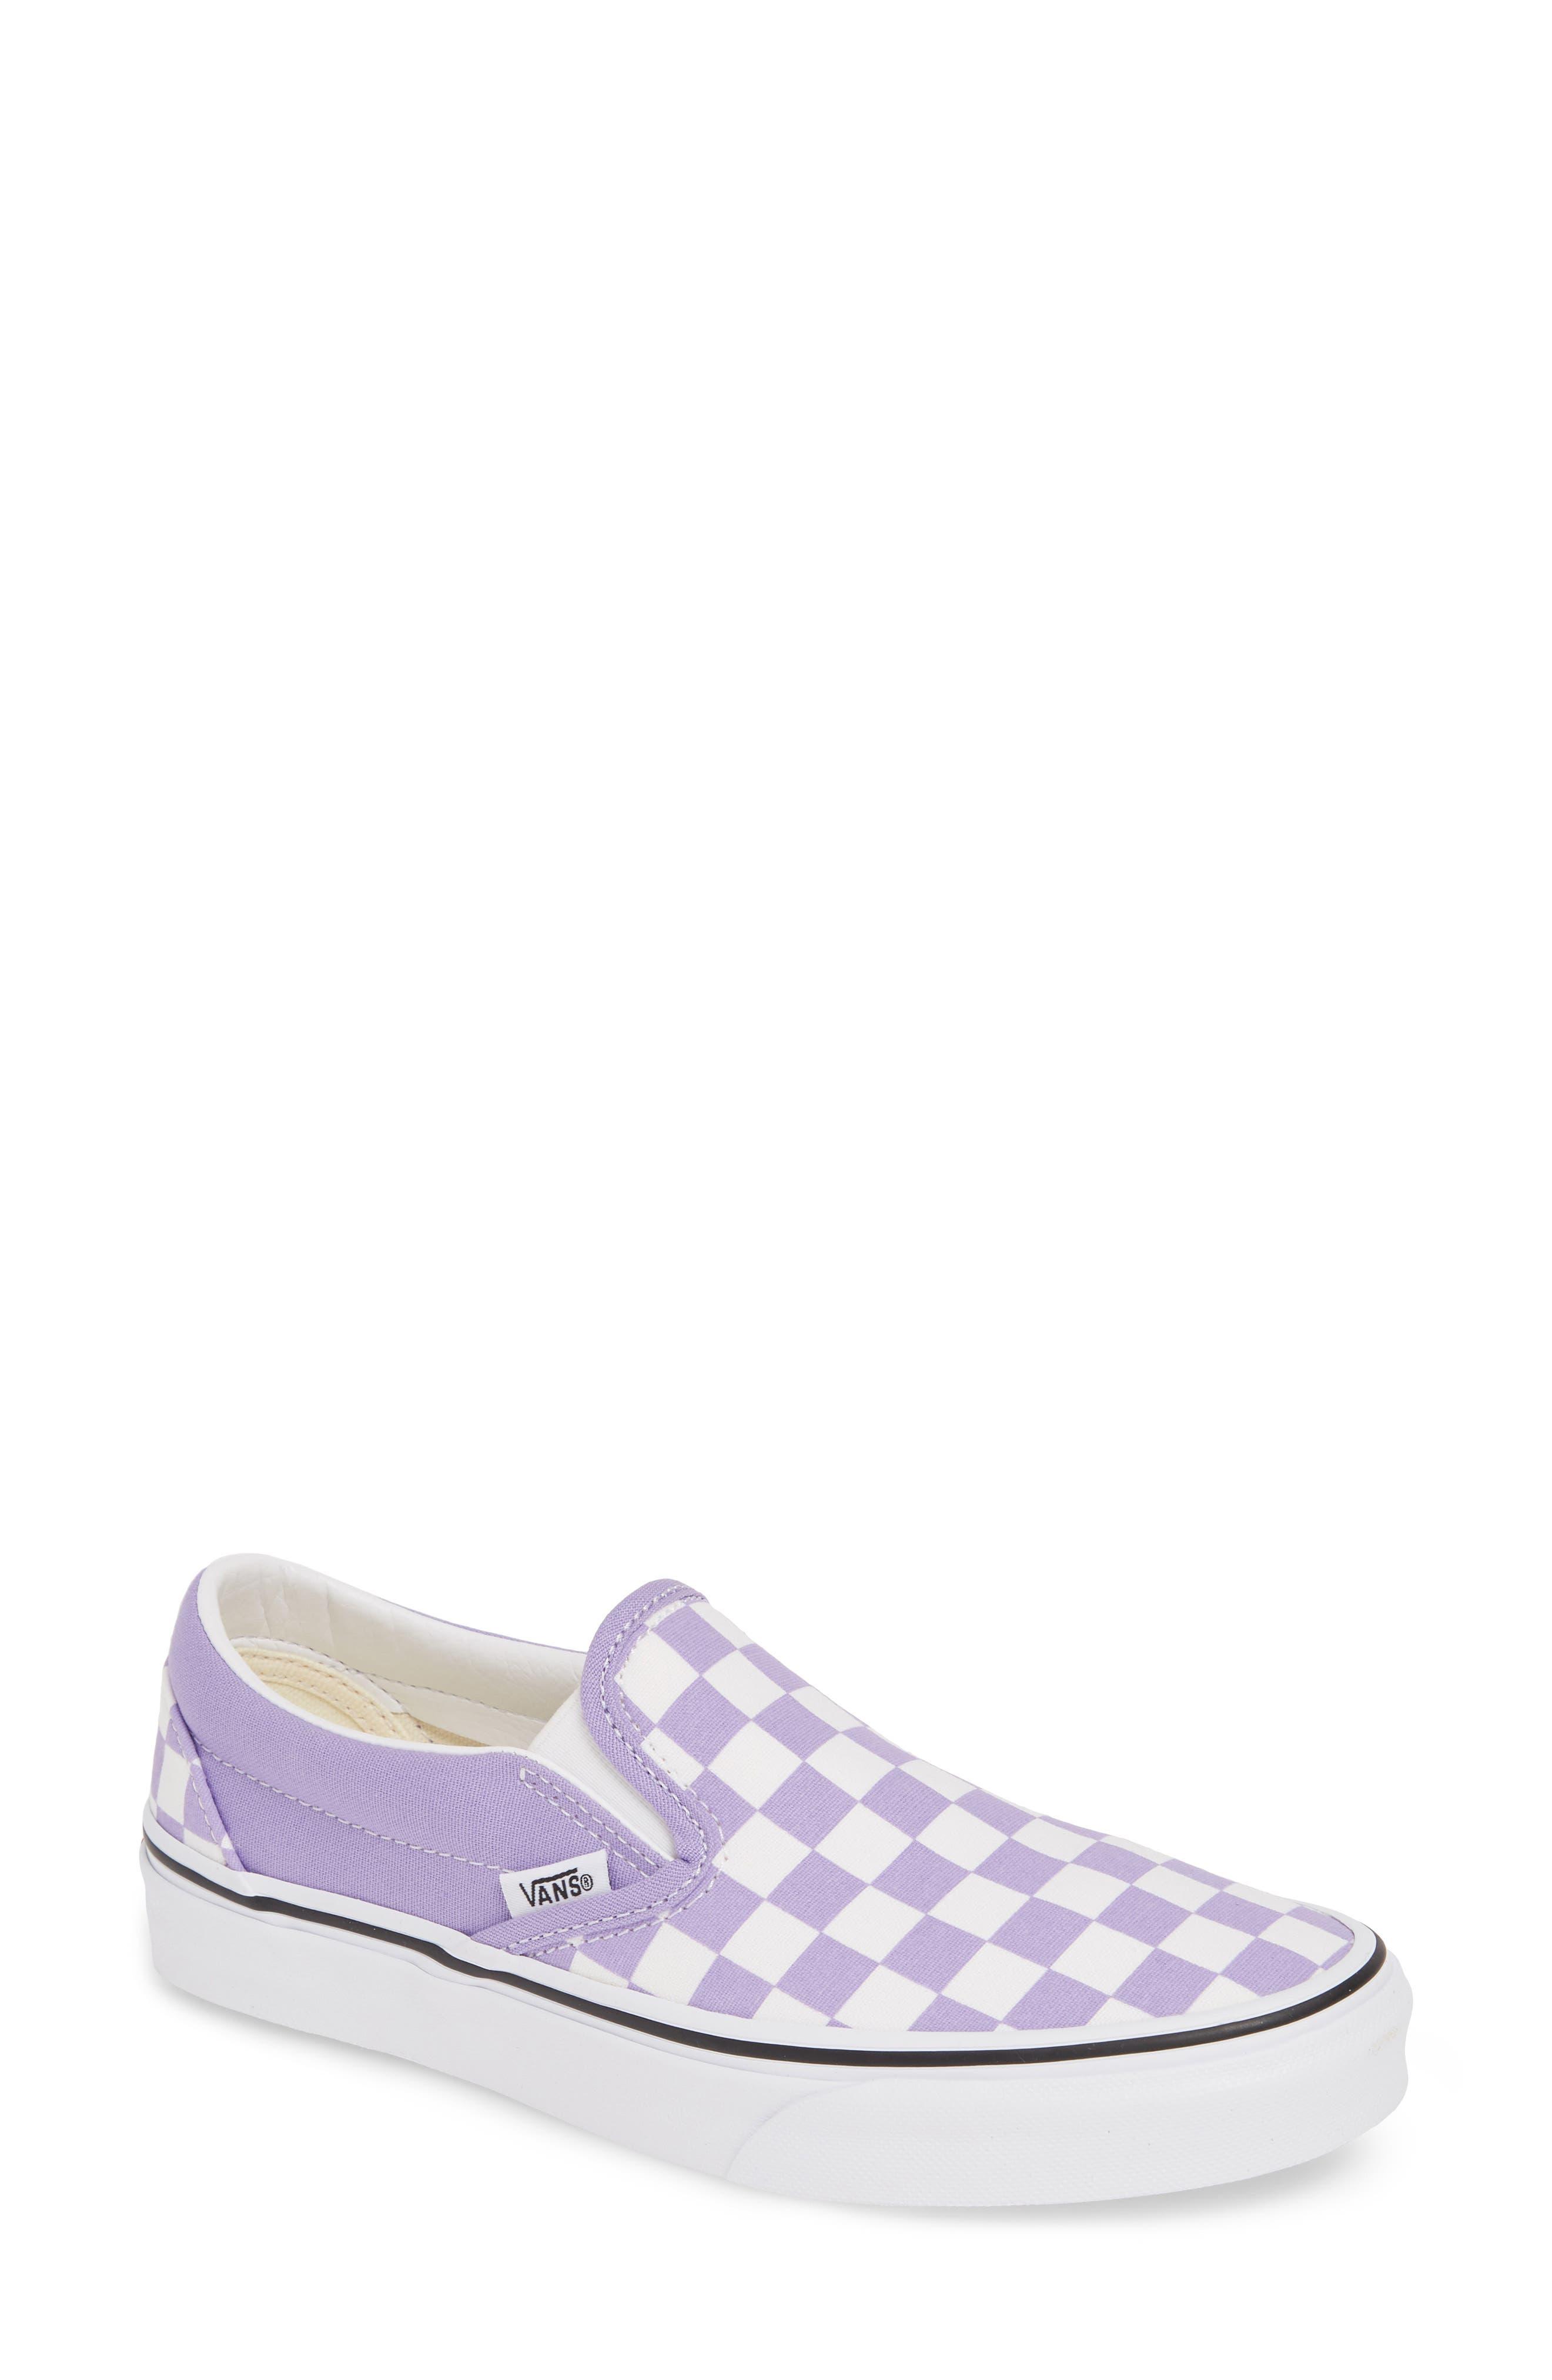 Vans Classic Slip-On Sneaker, Purple